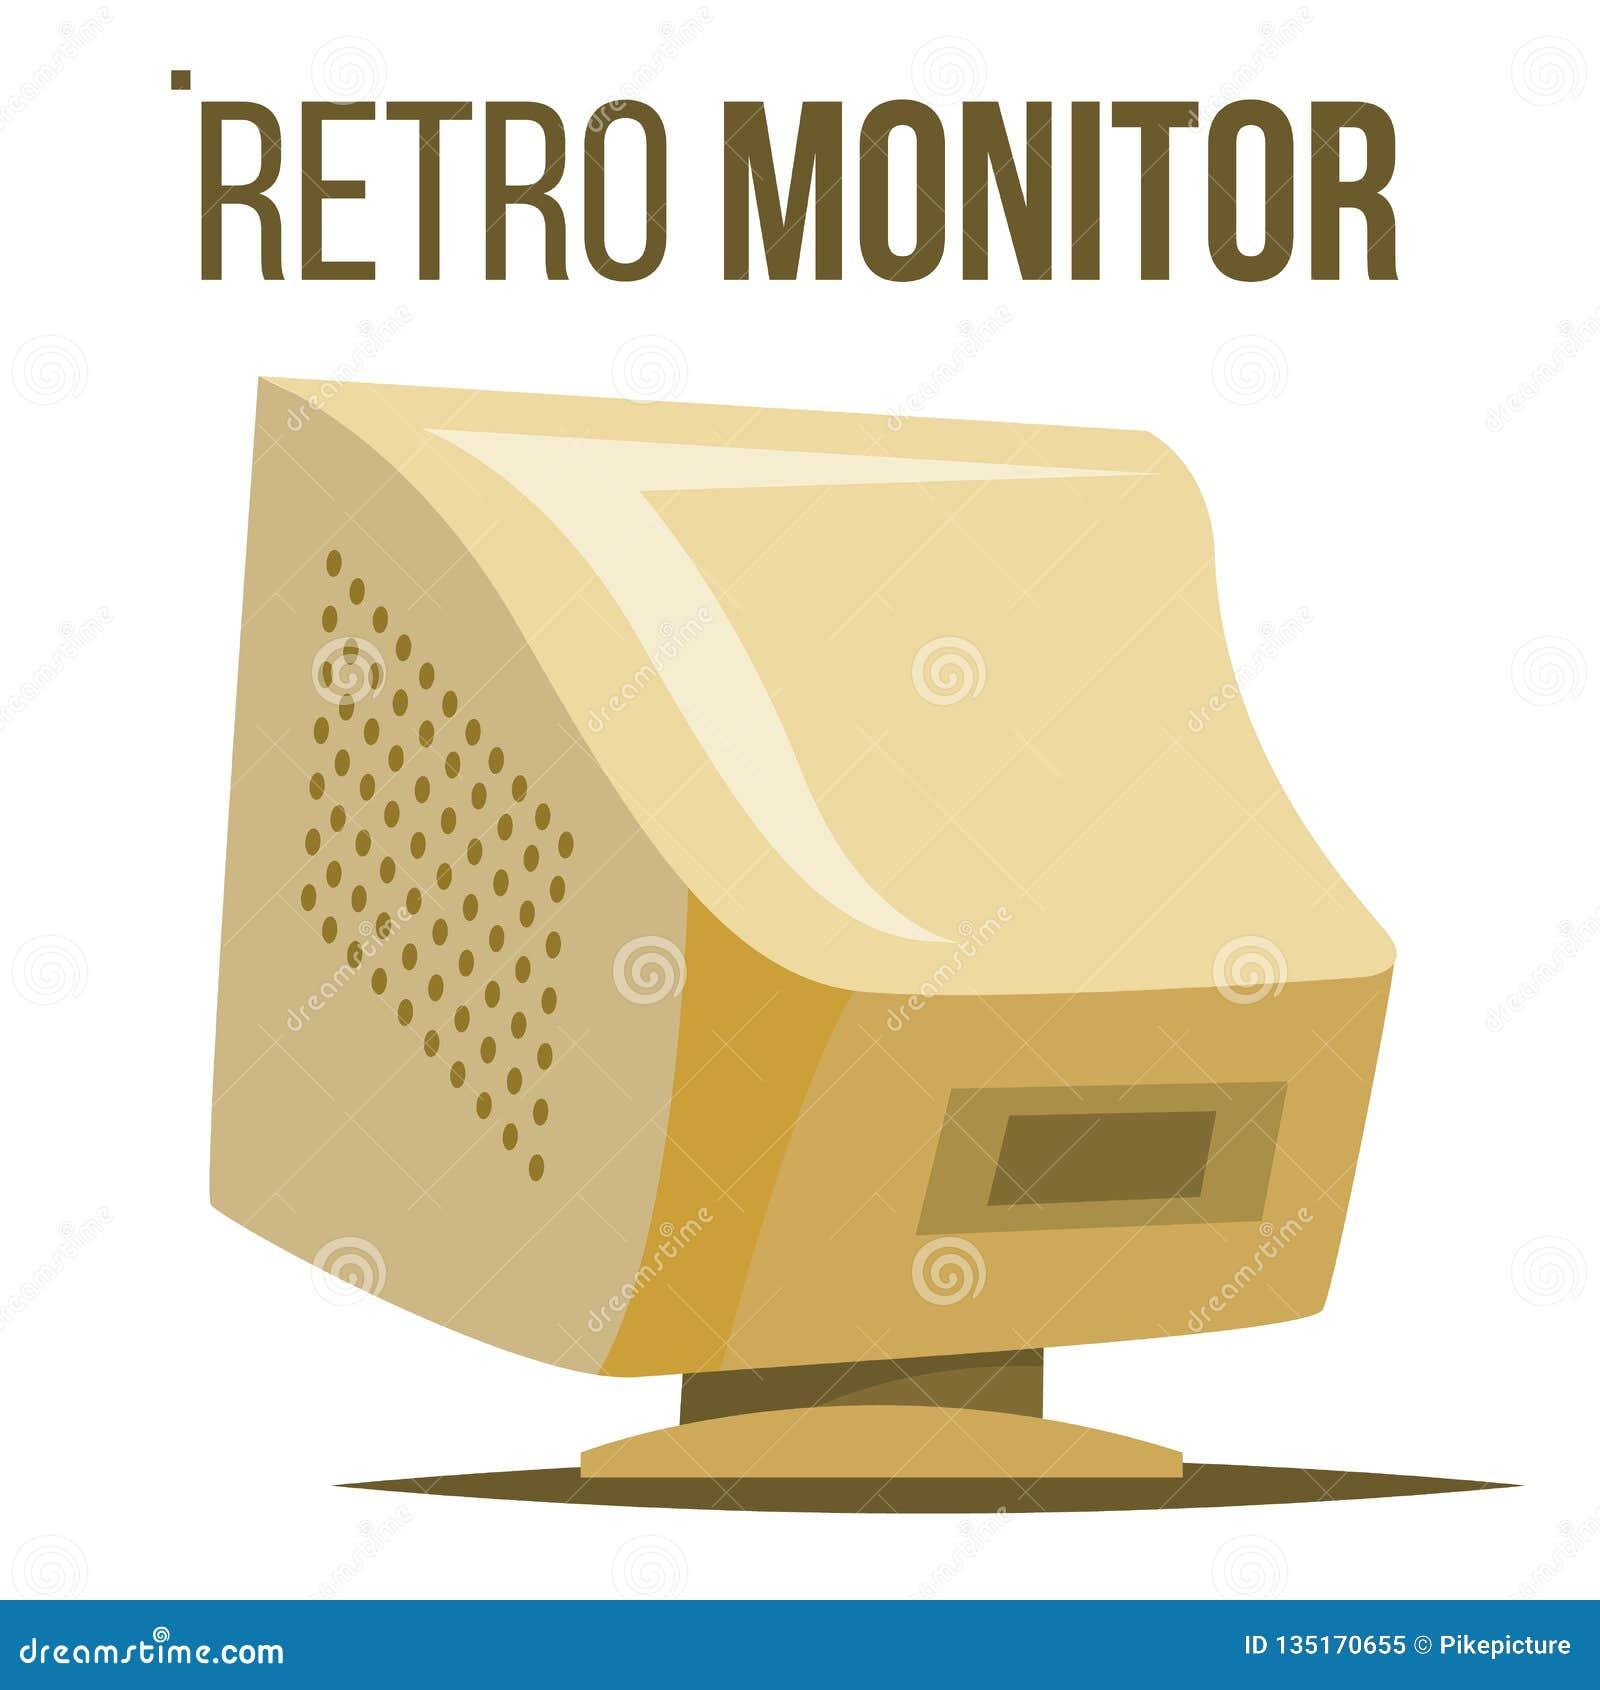 Vector retro del monitor de computadora Pantalla de computadora personal de escritorio clásica vieja Oficina, juego Historieta ai